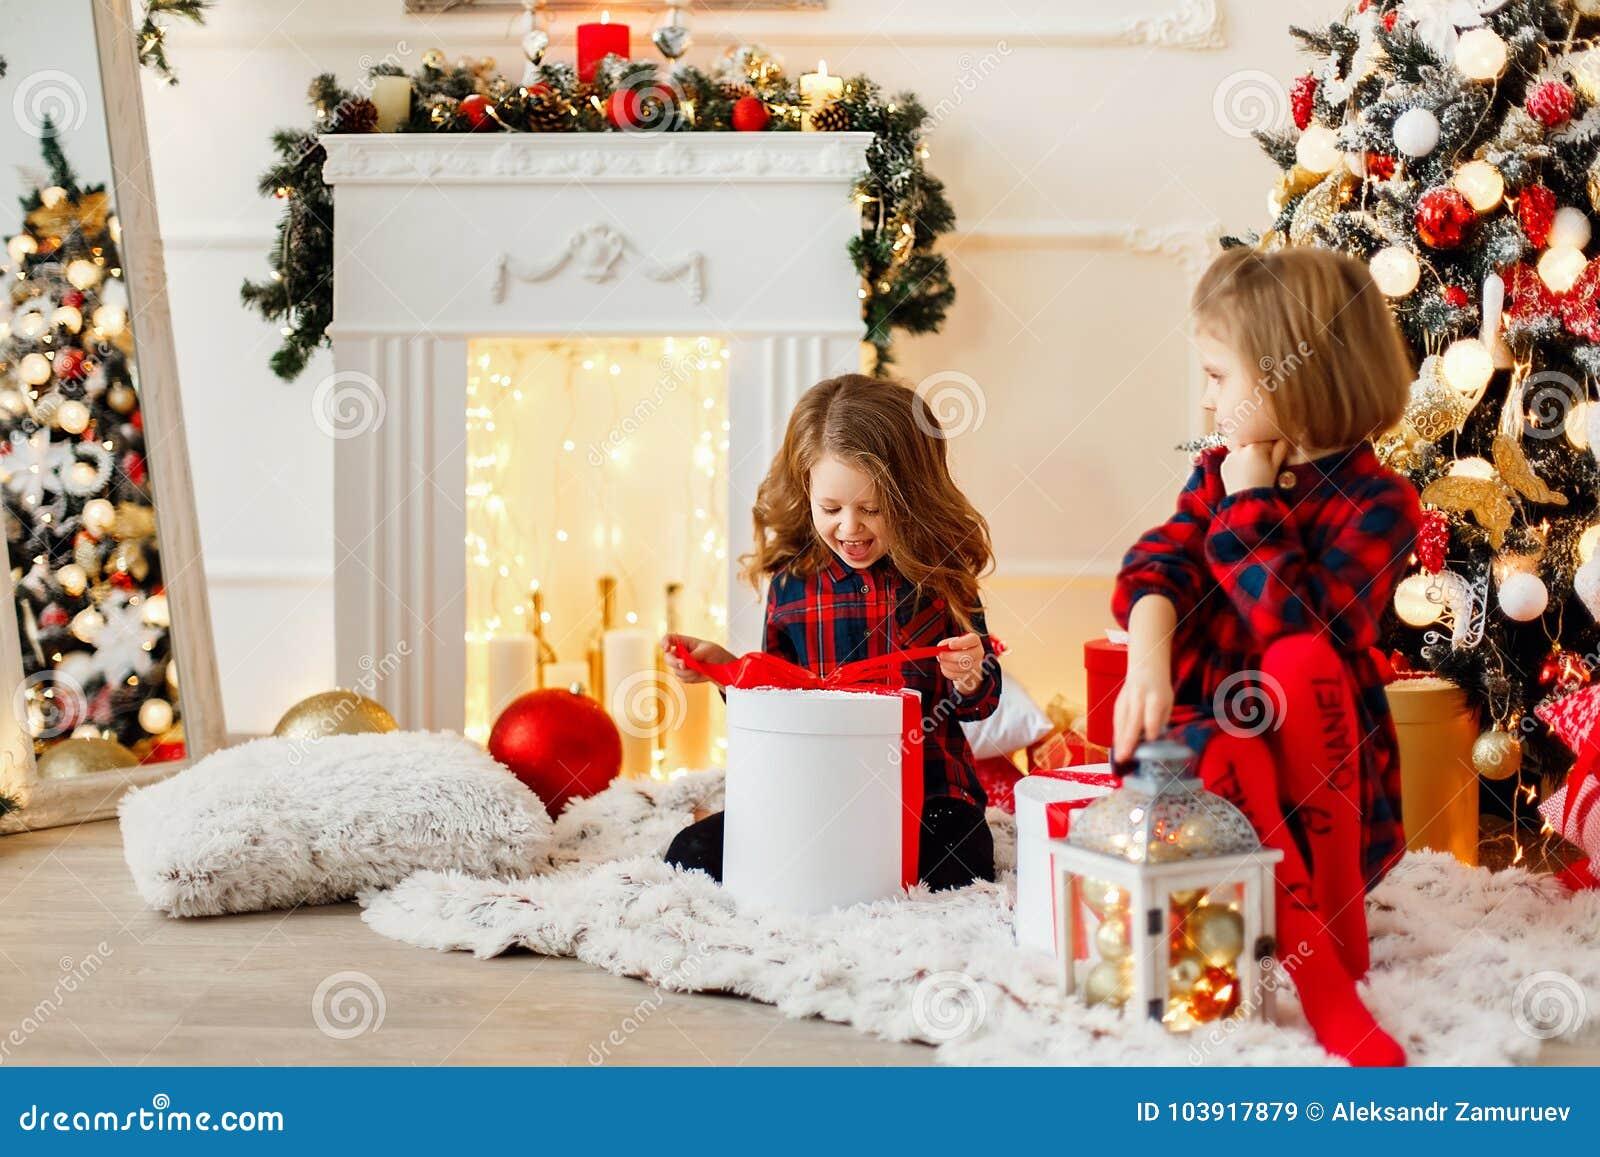 Girls opening Christmas presents